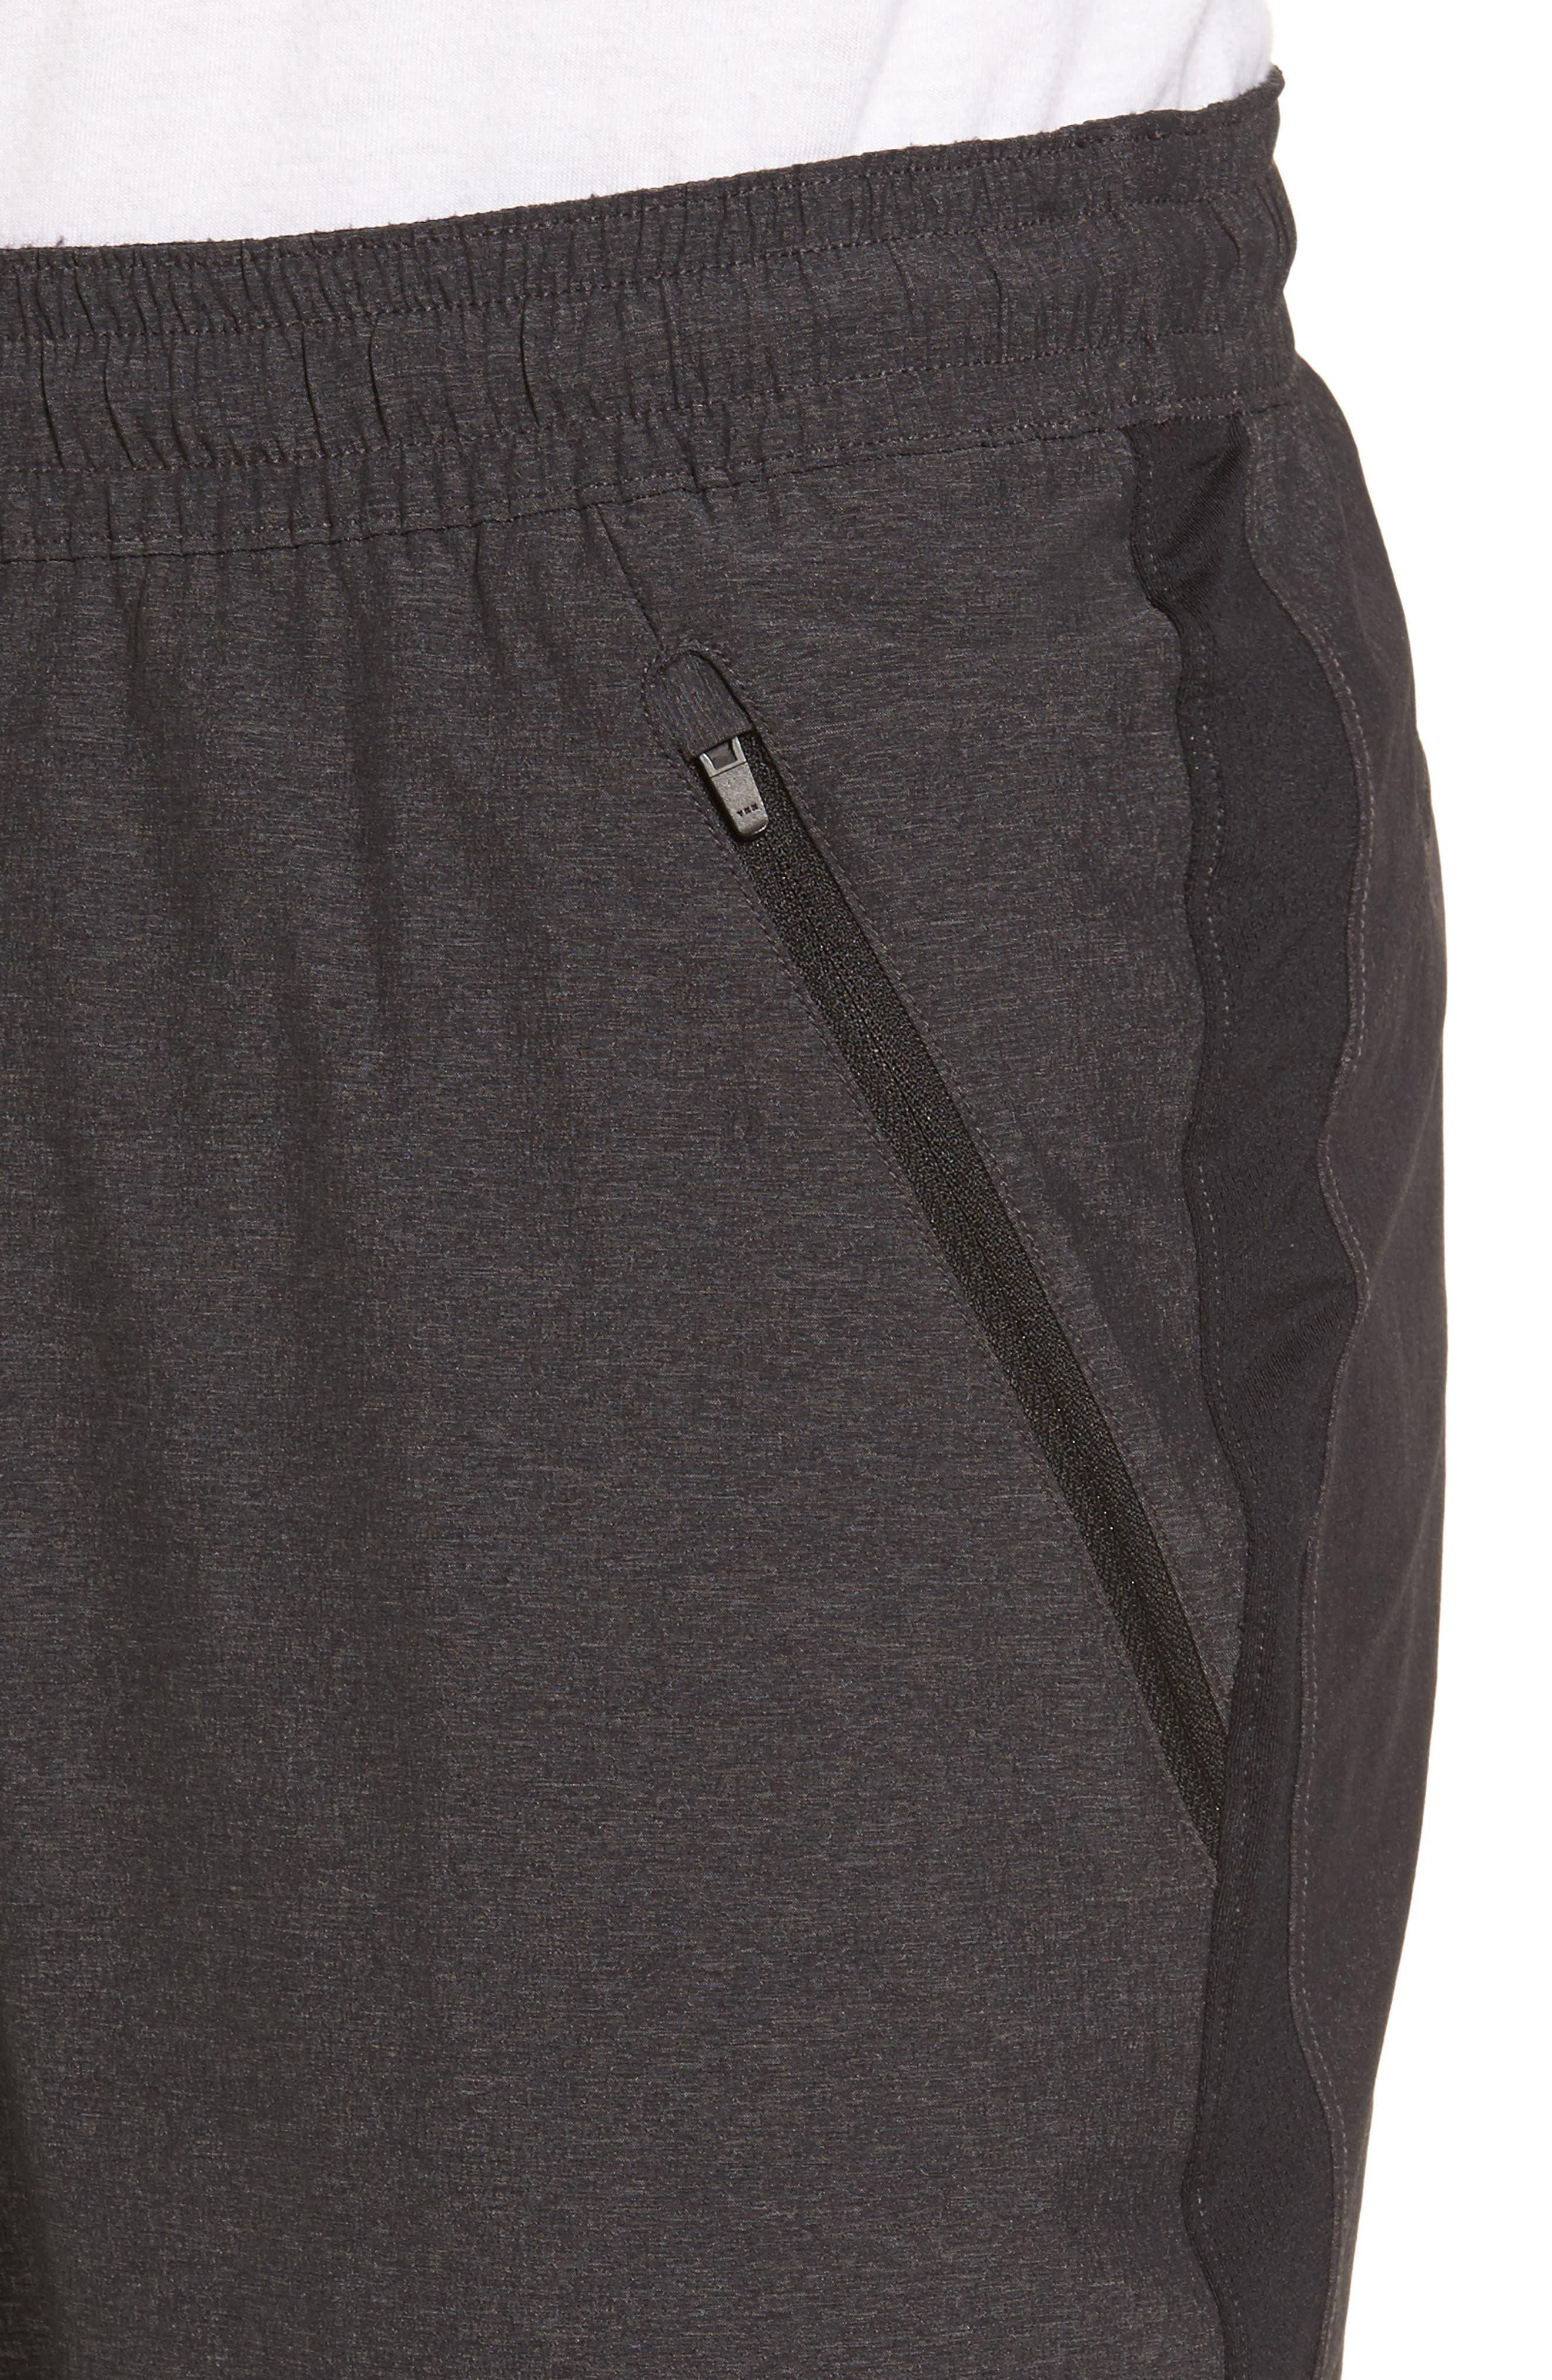 Zip Pocket Sweatpants,                             Alternate thumbnail 4, color,                             021